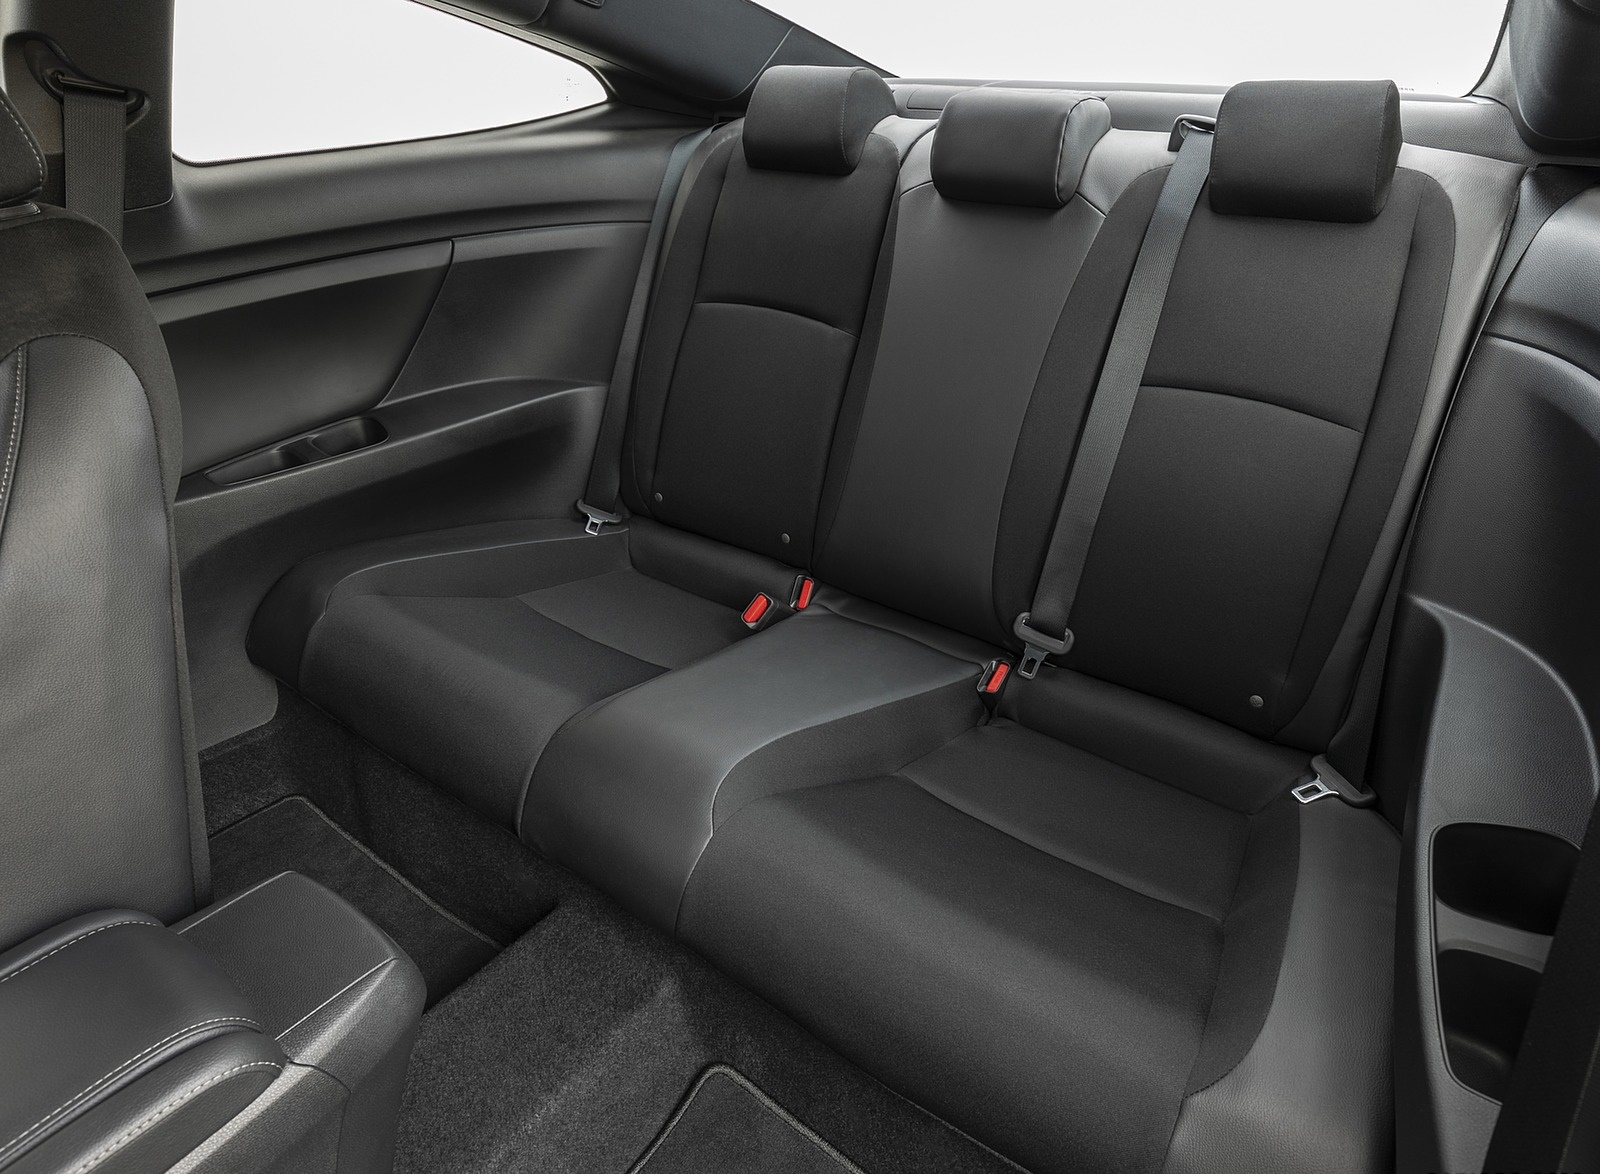 2020 honda civic coupe sport interior rear seats wallpapers 63 newcarcars newcarcars